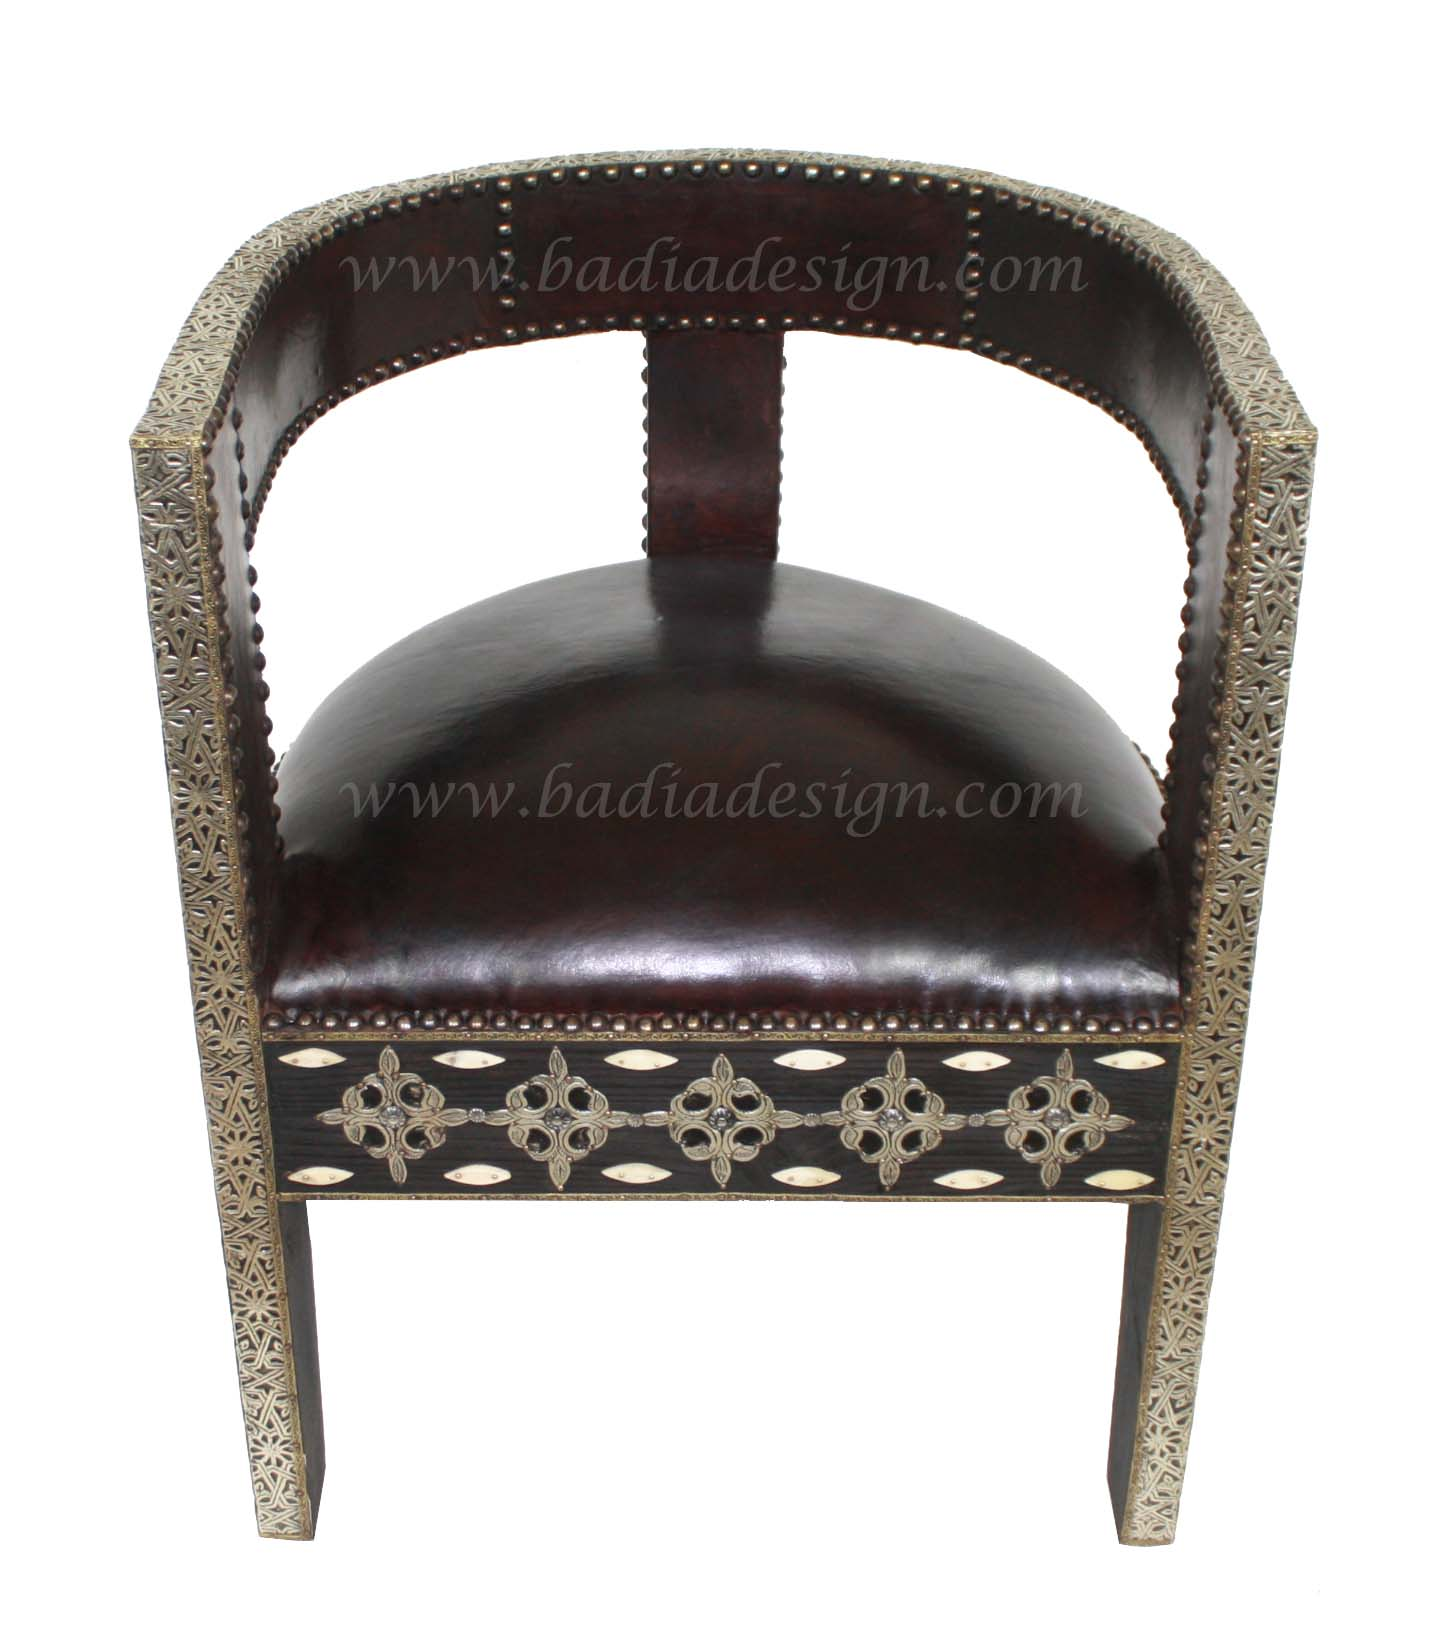 moroccan-metal-and-bone-chair-los-angeles-mb-ch027-1.jpg